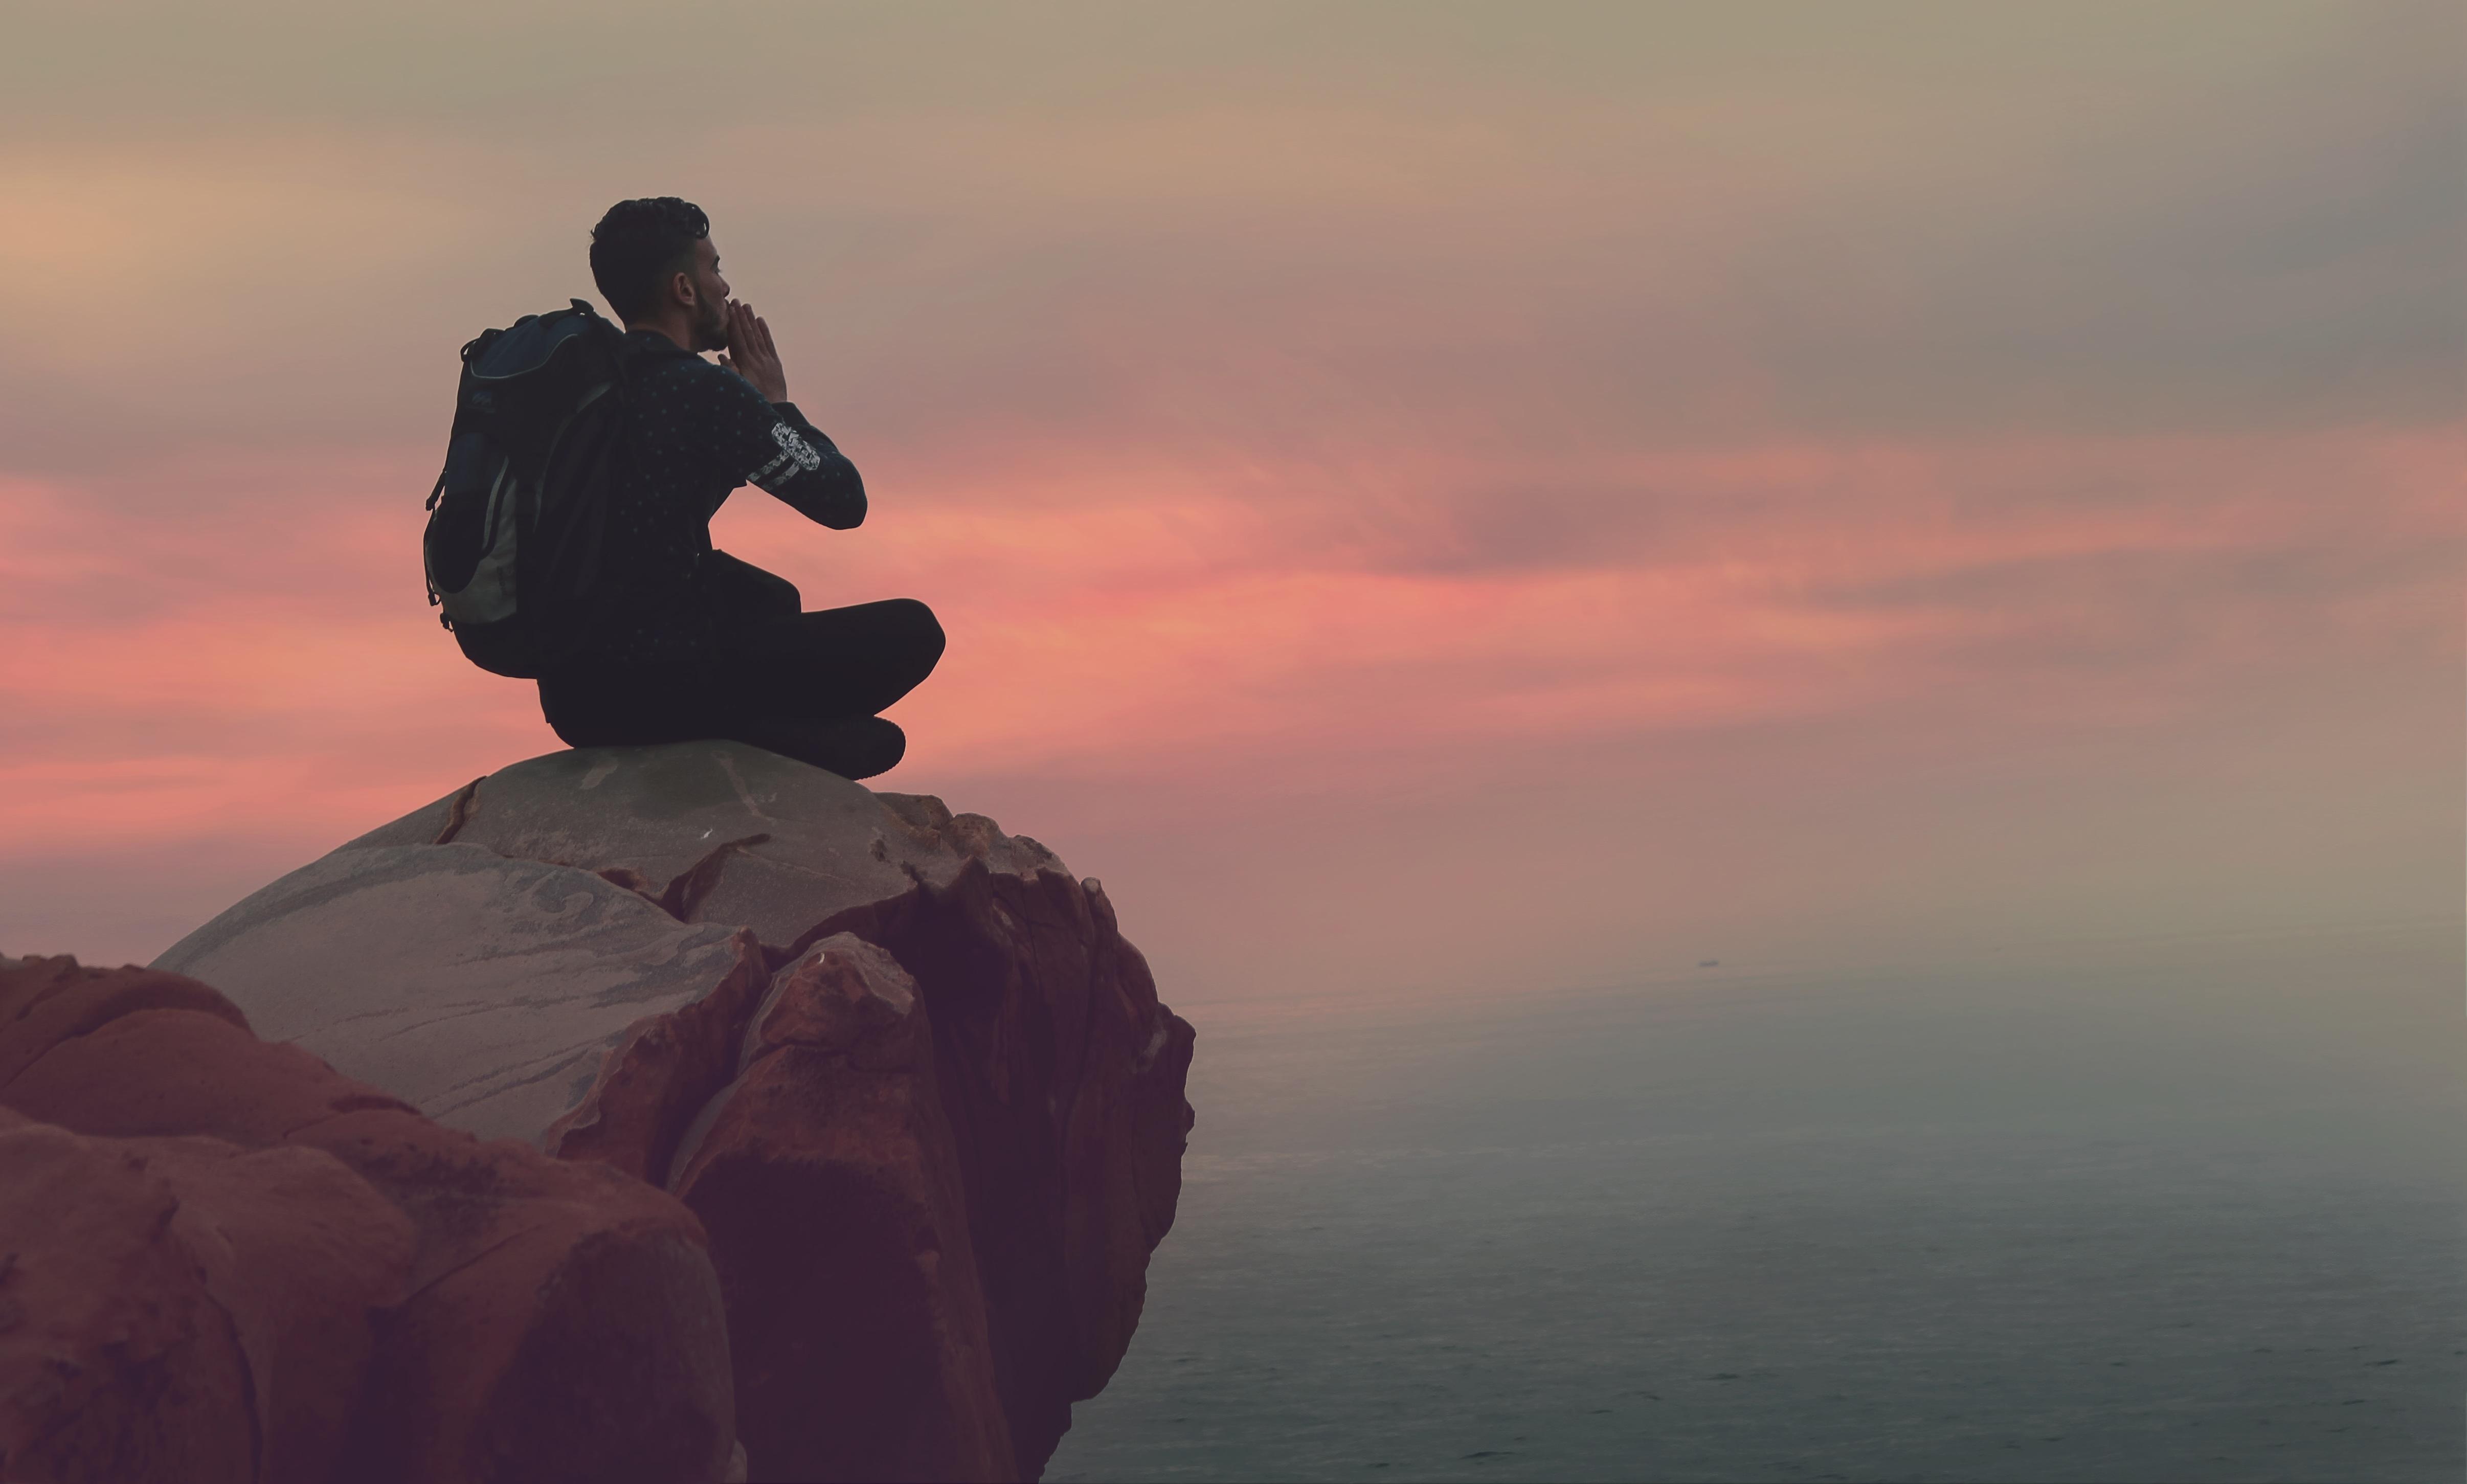 Deepack chopra - meditazione per il desiderio